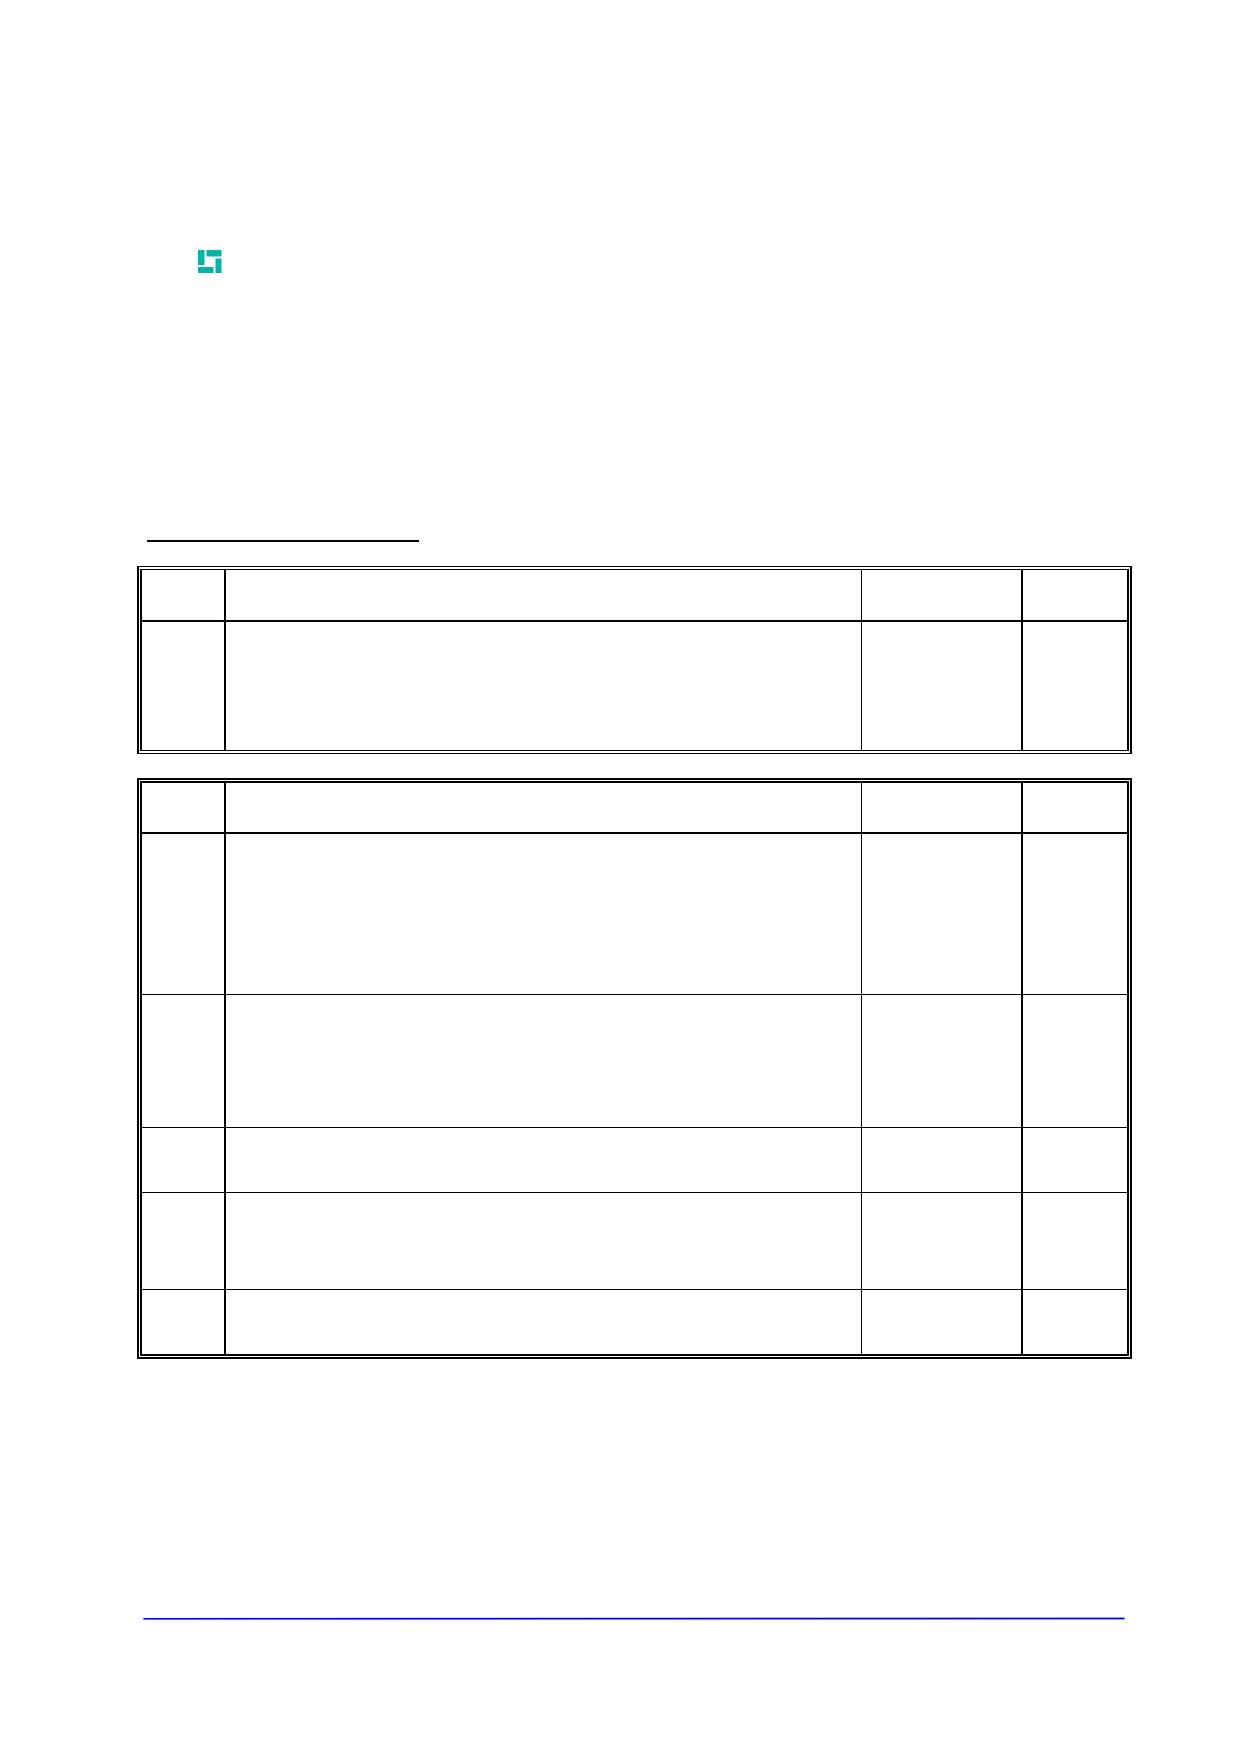 R0472YS12E datasheet